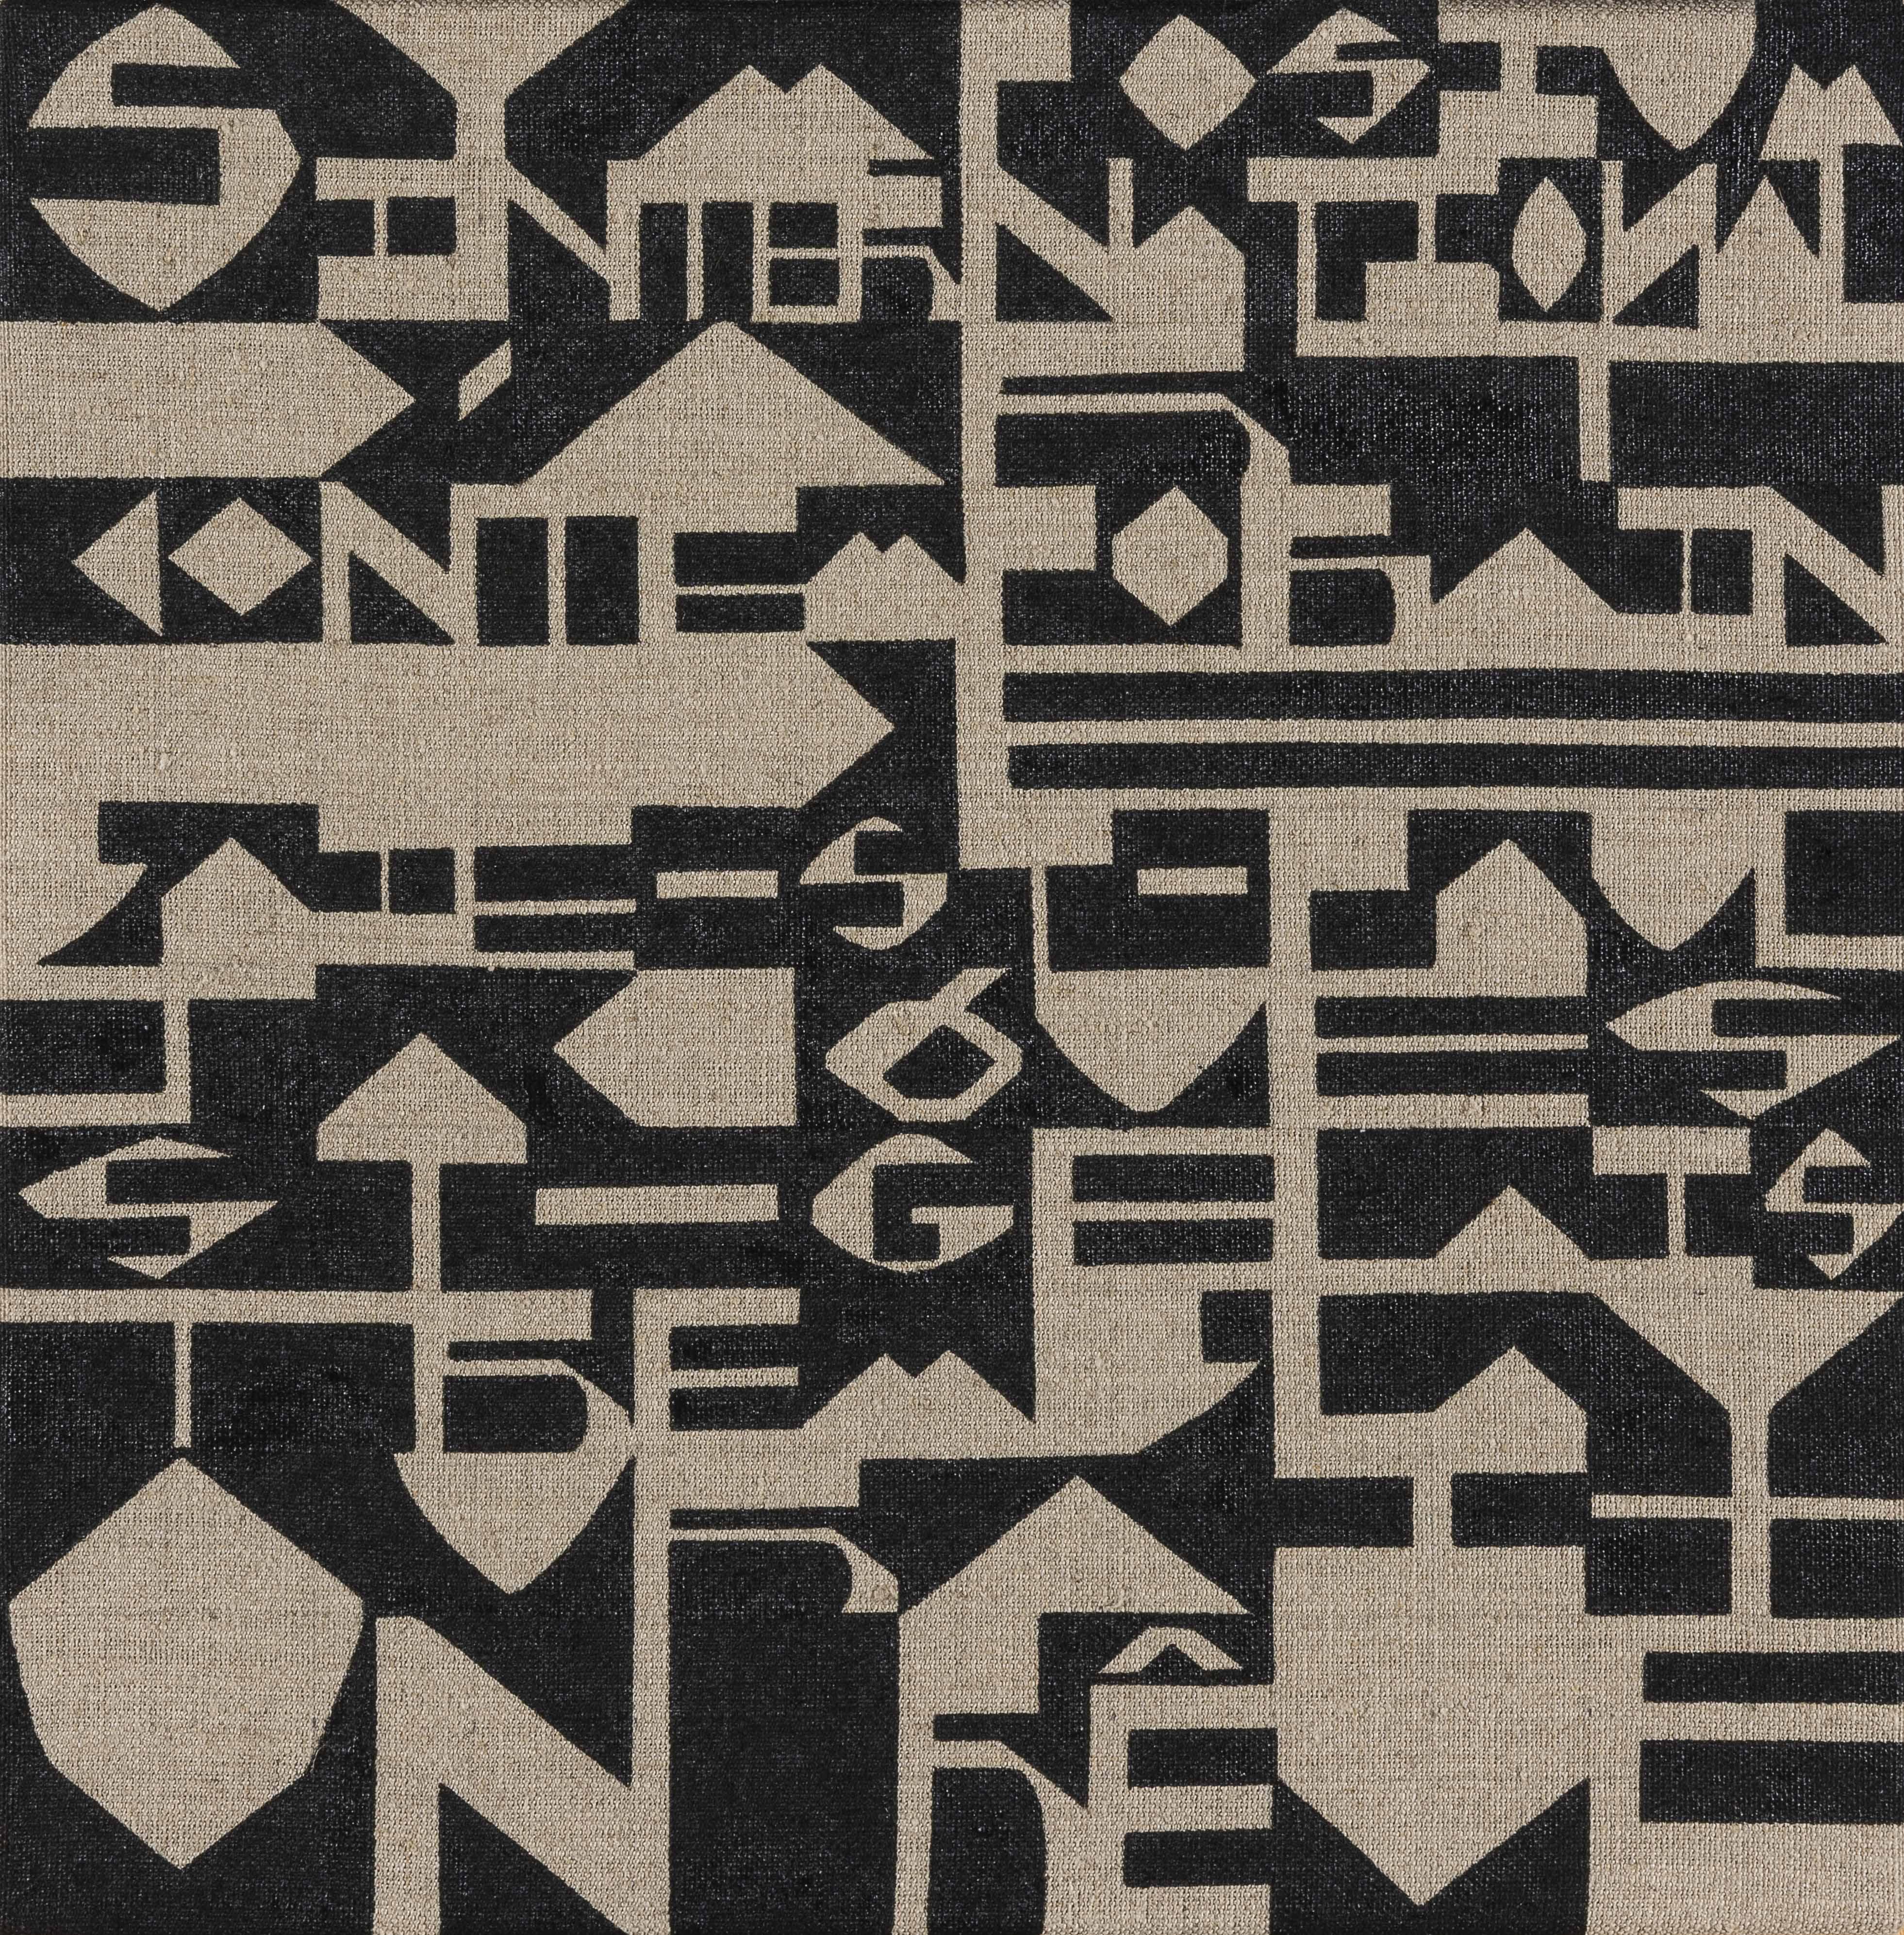 03_Karen Elaine Spencer_33e Symposium international d'art contemporain_Photo René Bouchard_BR